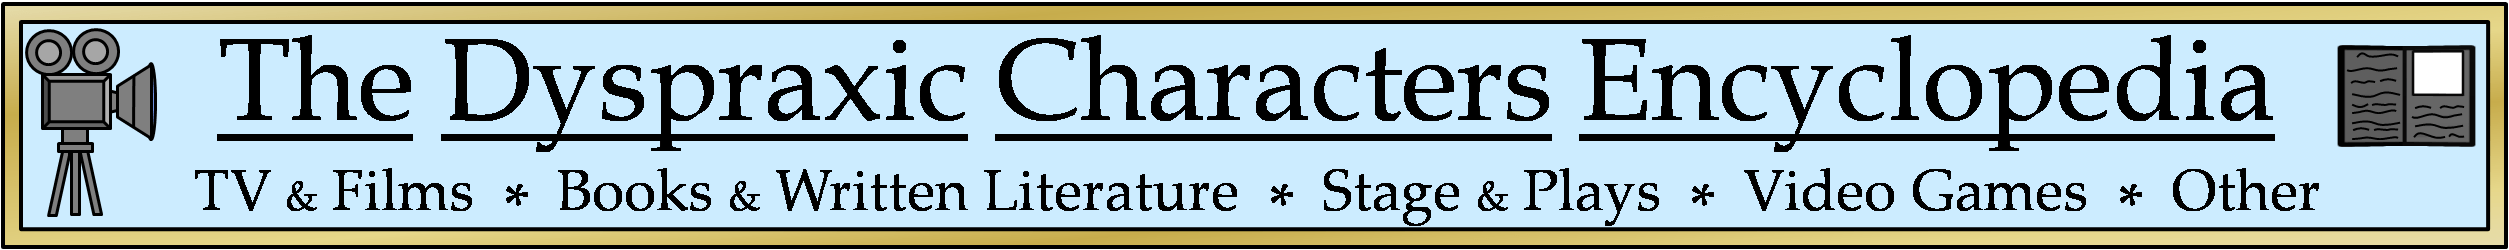 Dyspraxic Characters Encyclopedia